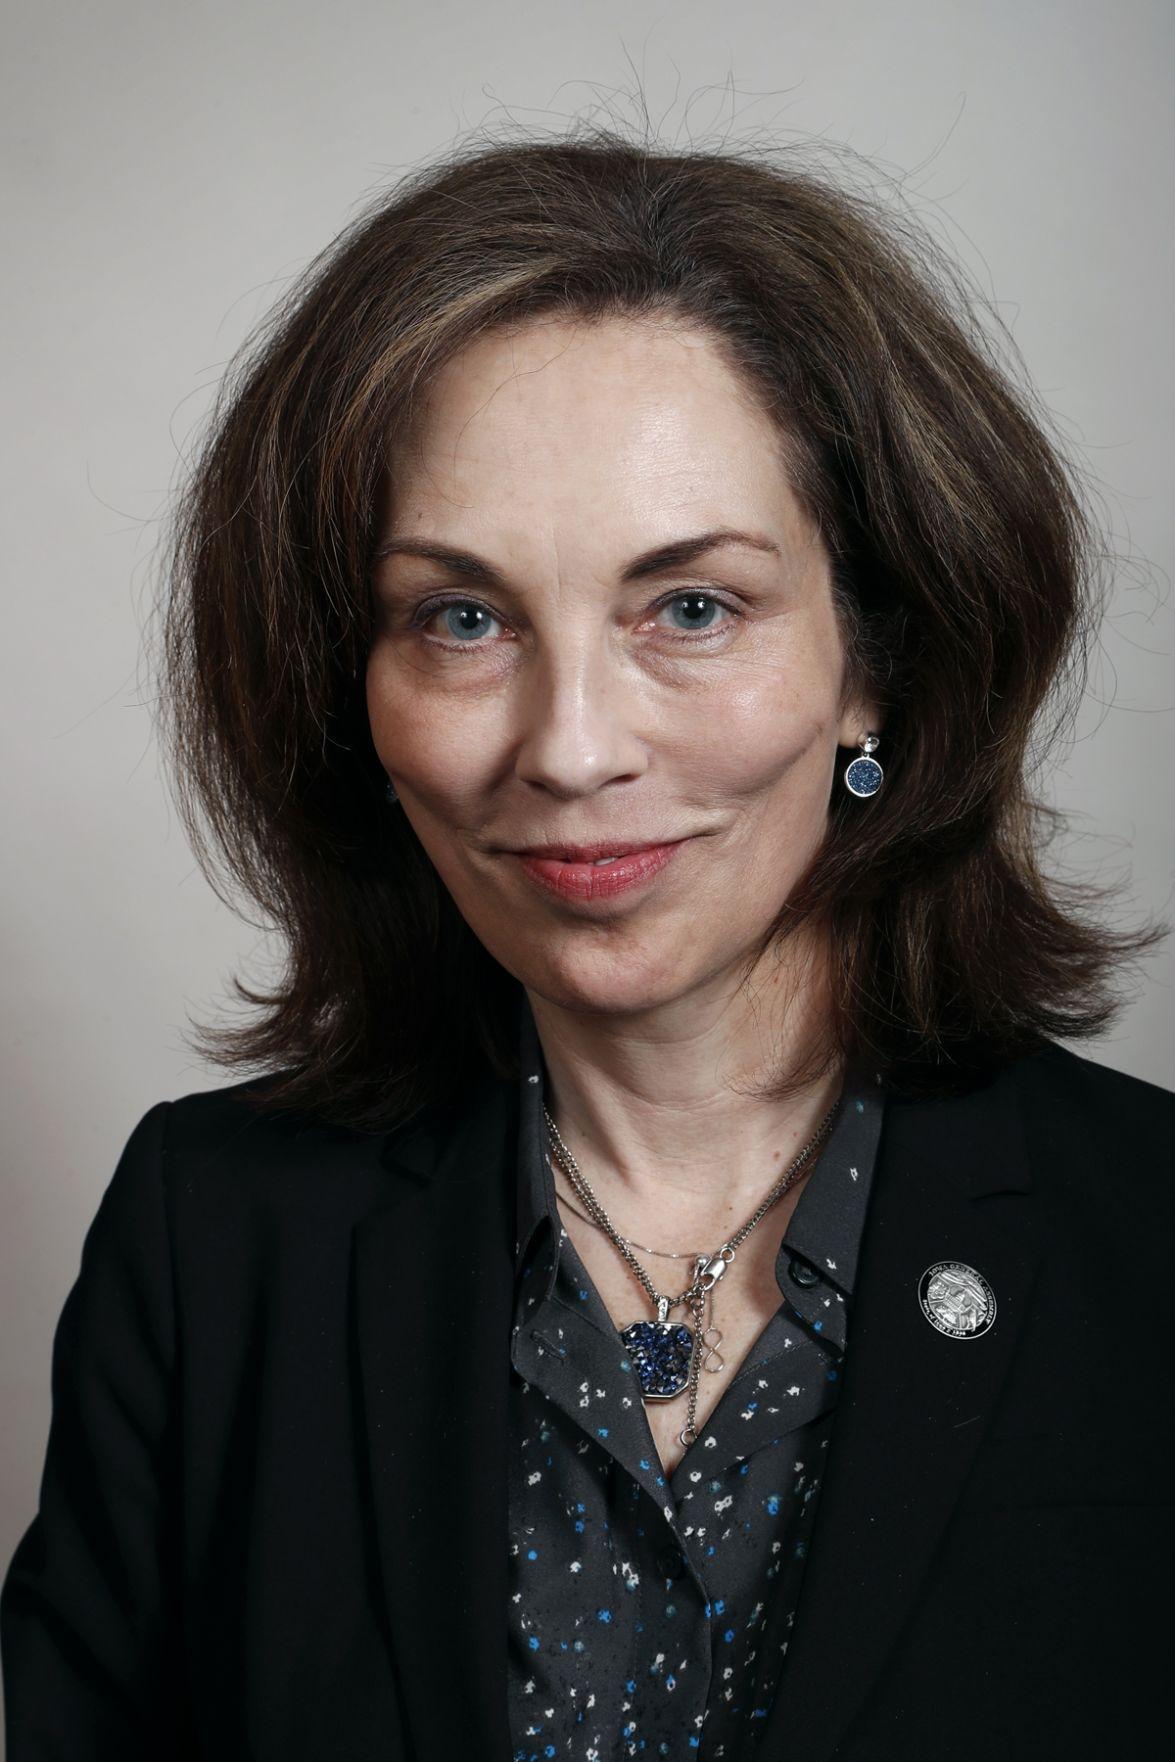 Iowa state Rep. Mary Wolfe